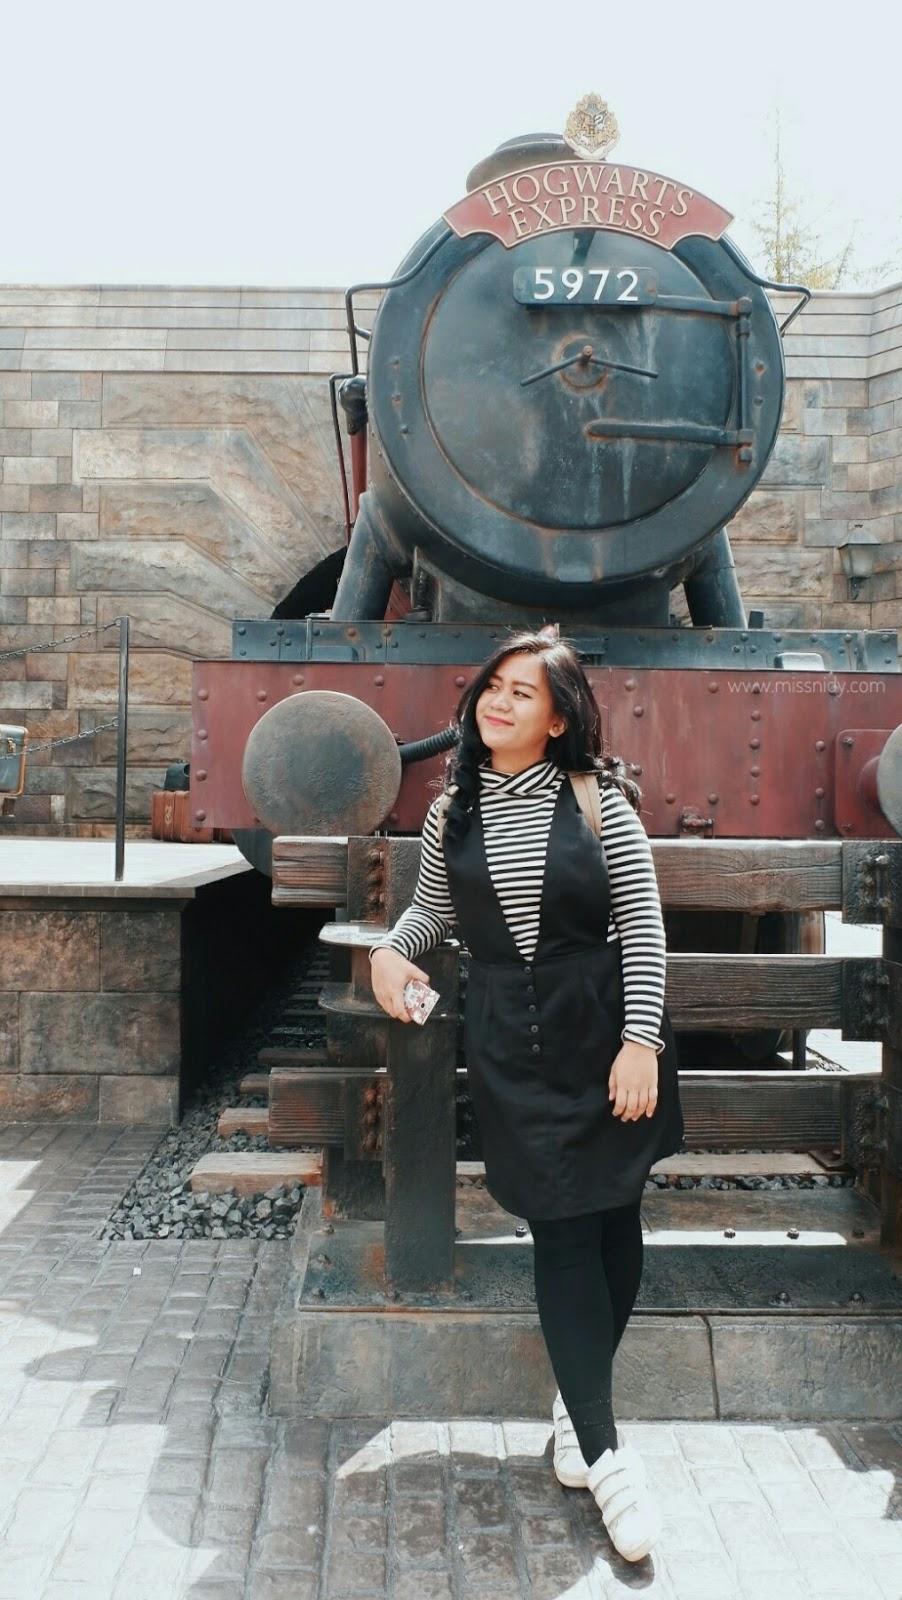 hogwarts express usj